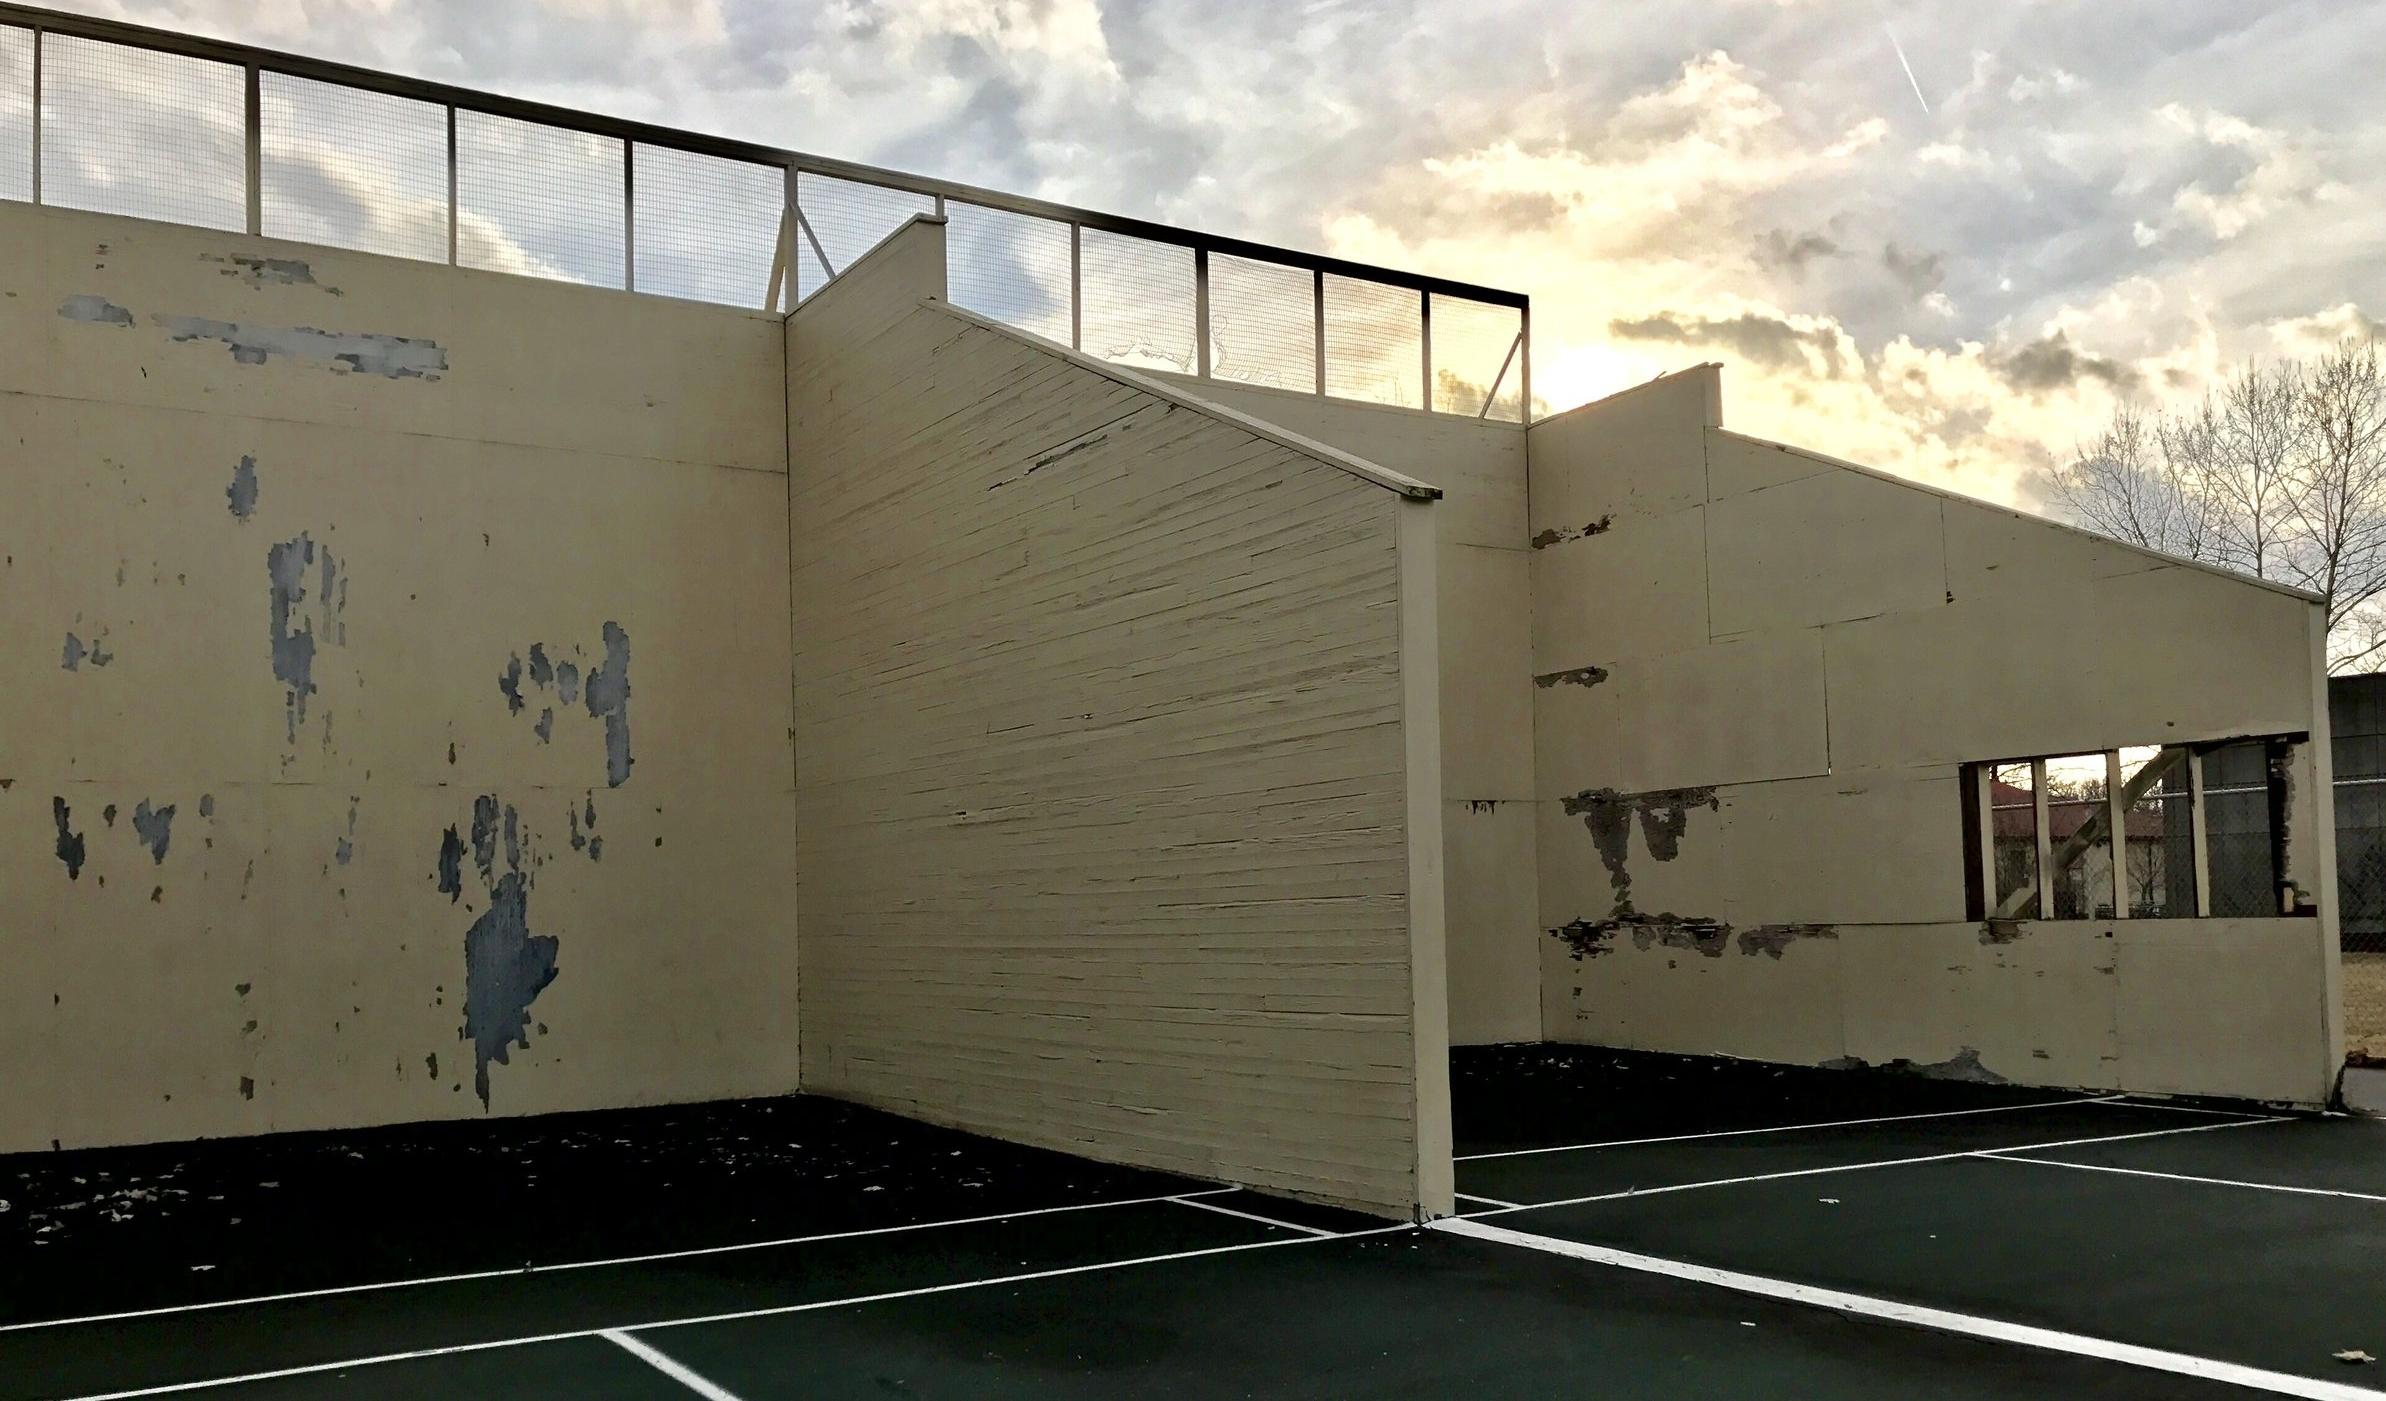 A look at the handball courts before repairs begin.